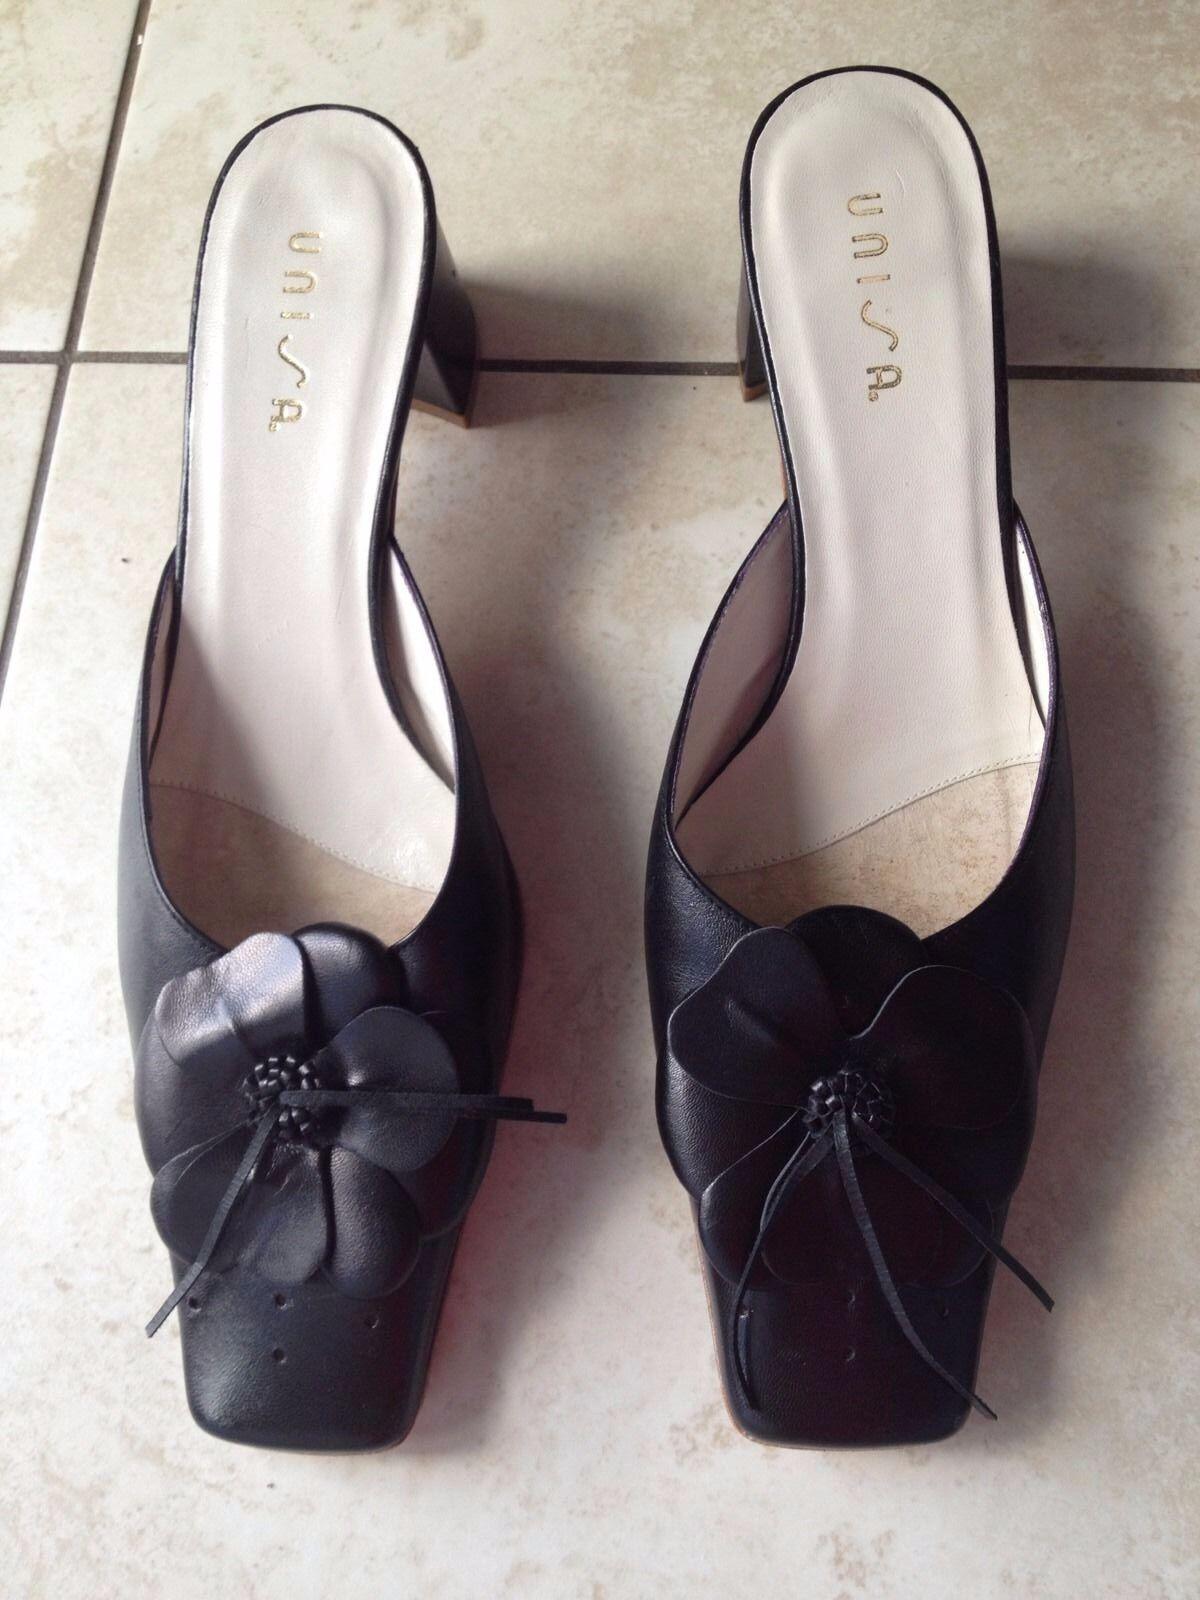 Unisa Black Ladies Heeled Mule Slip On Shoes Size 40   7. Great Condition. c4279b0720